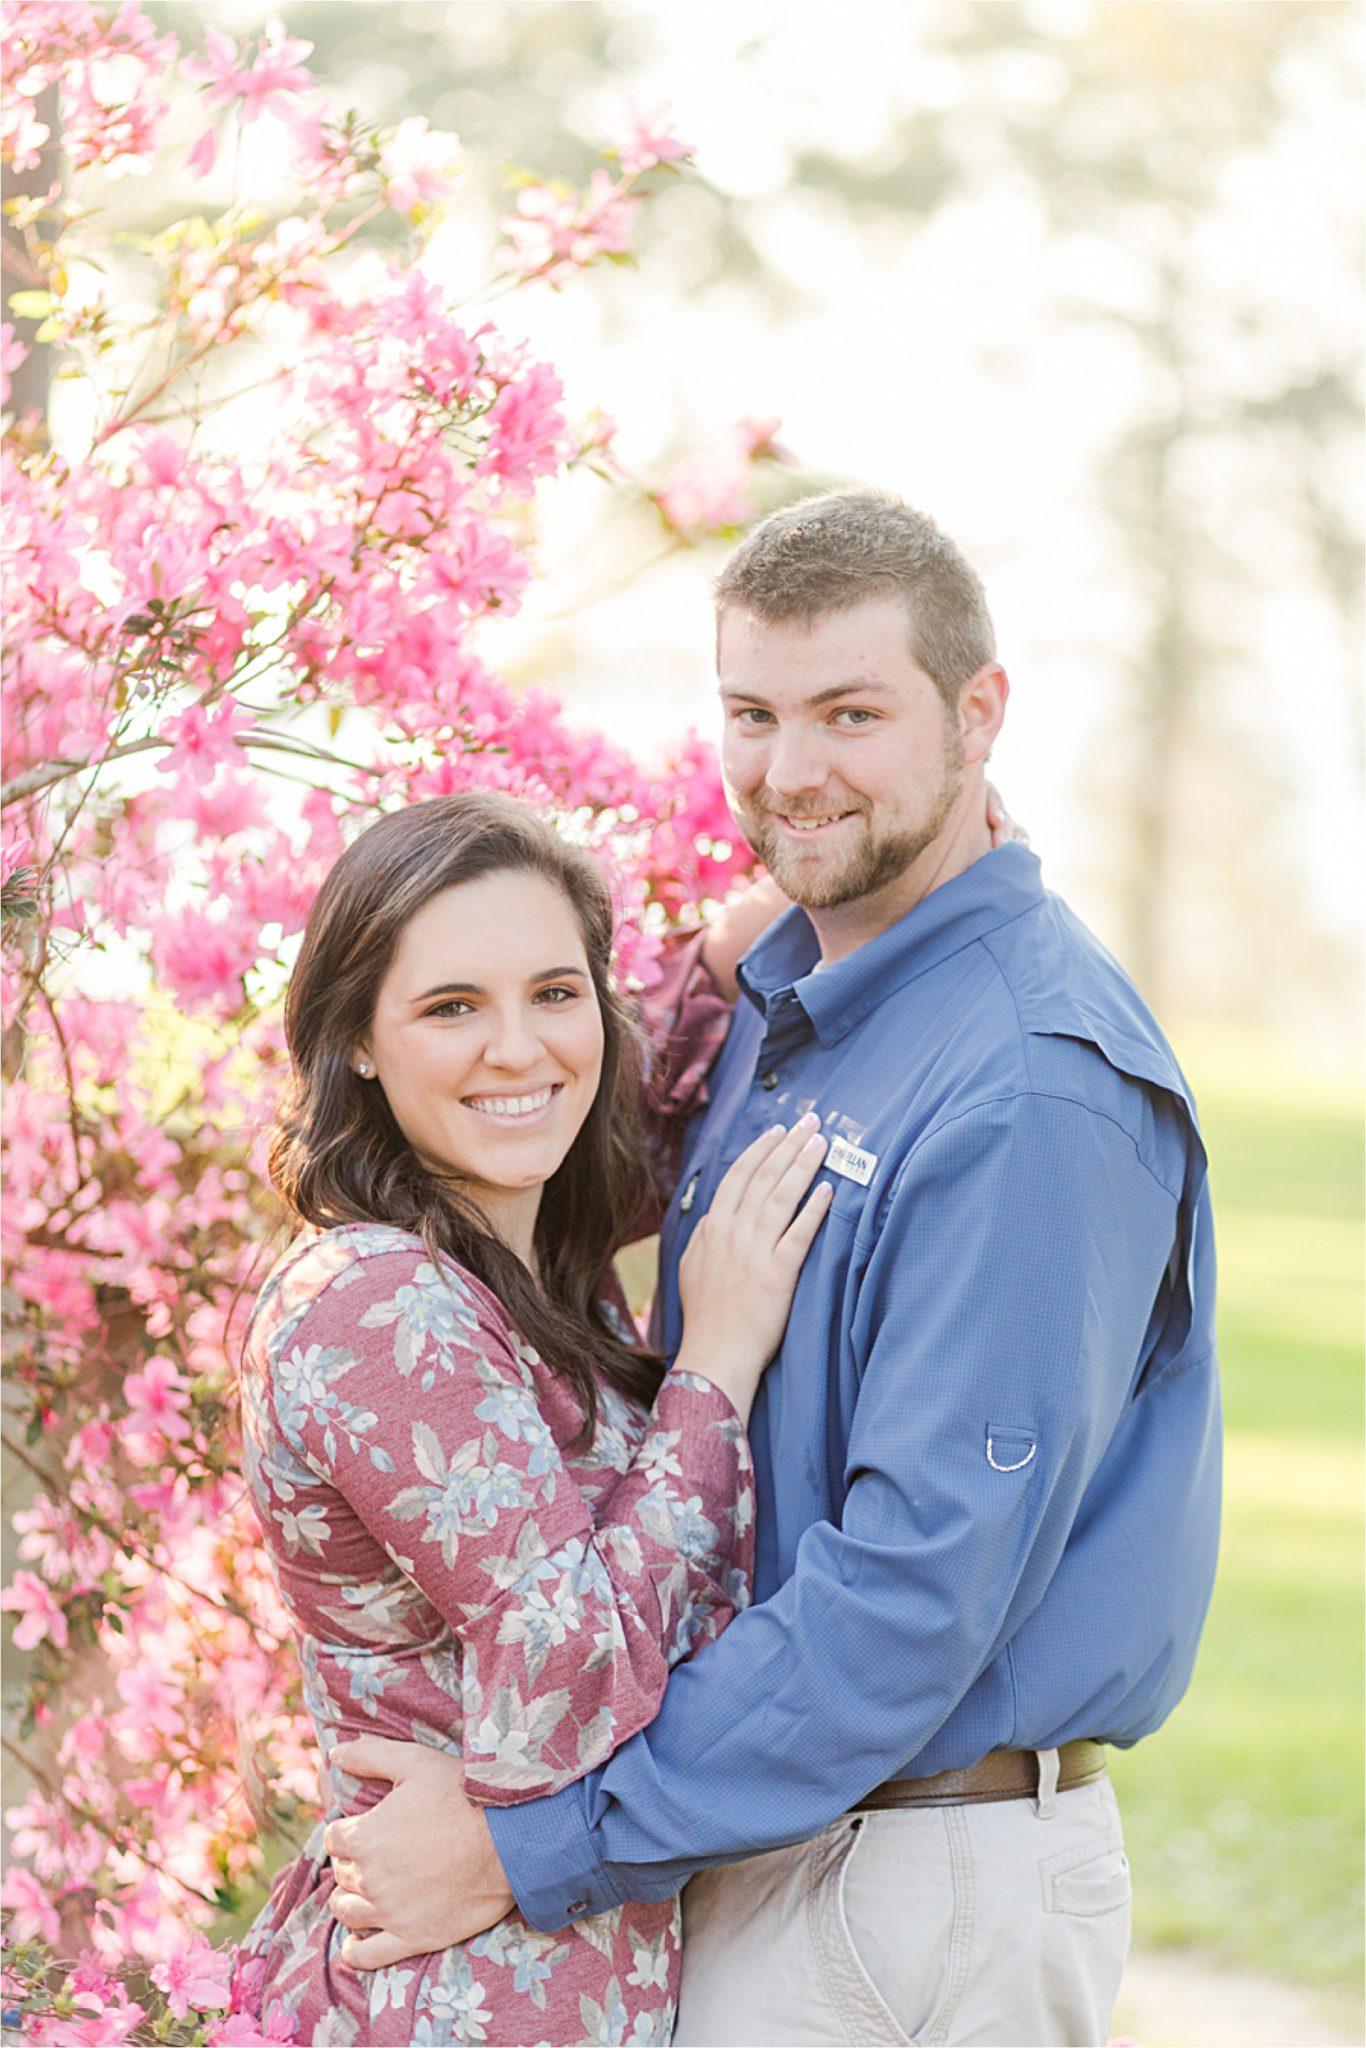 Fairhope Alabama Engagement Session Photographer | Danielle + Taylor